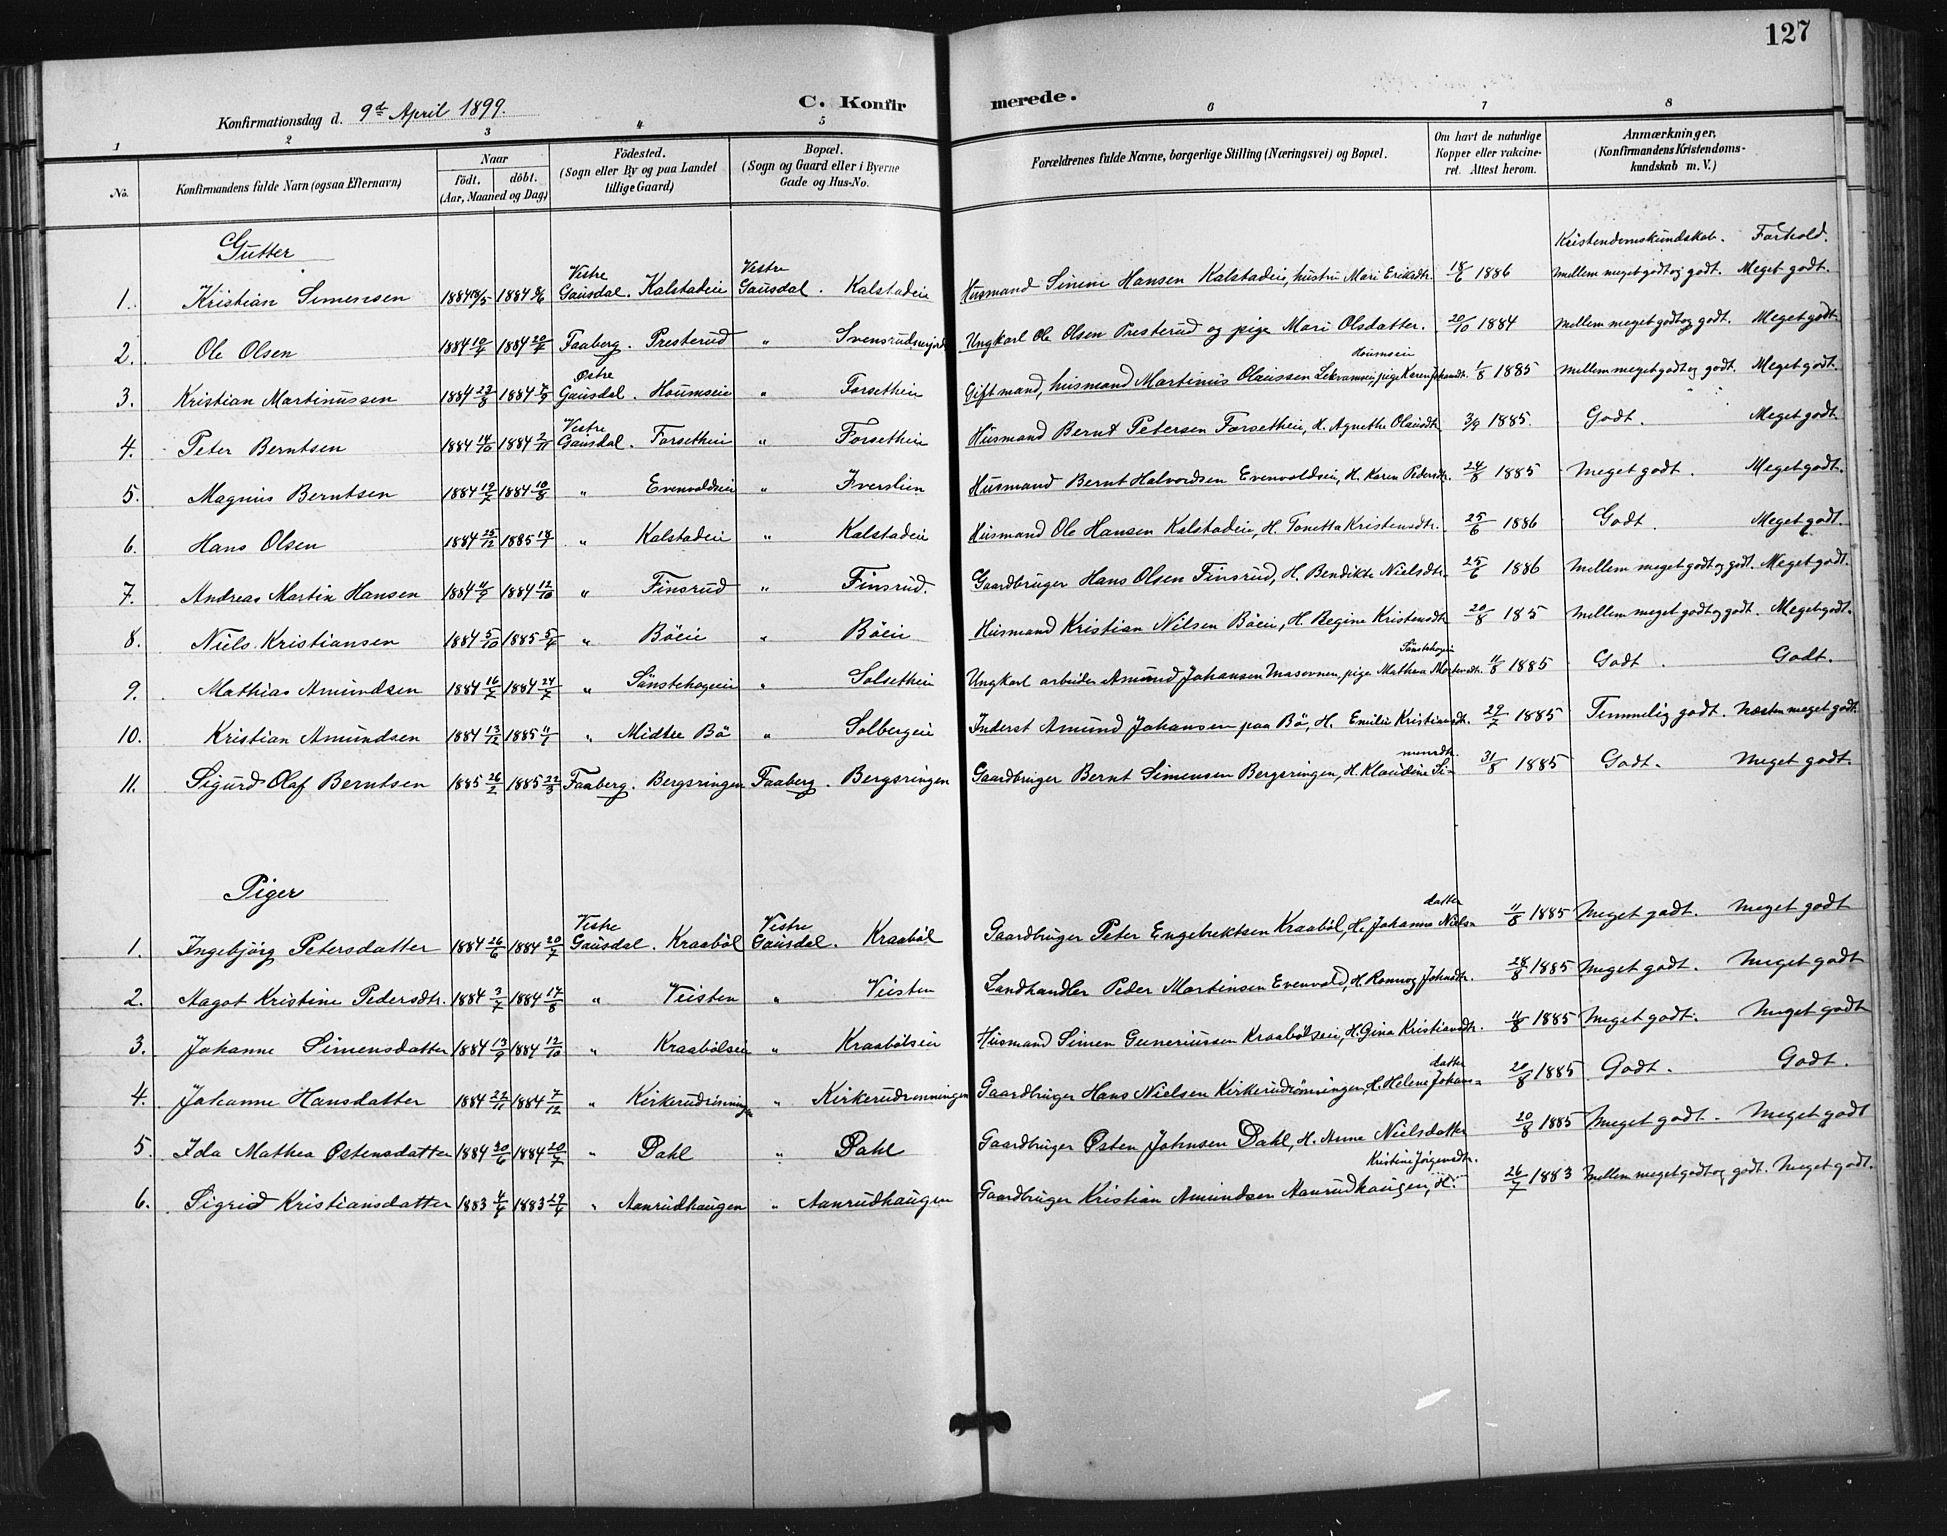 SAH, Vestre Gausdal prestekontor, Klokkerbok nr. 3, 1896-1925, s. 127